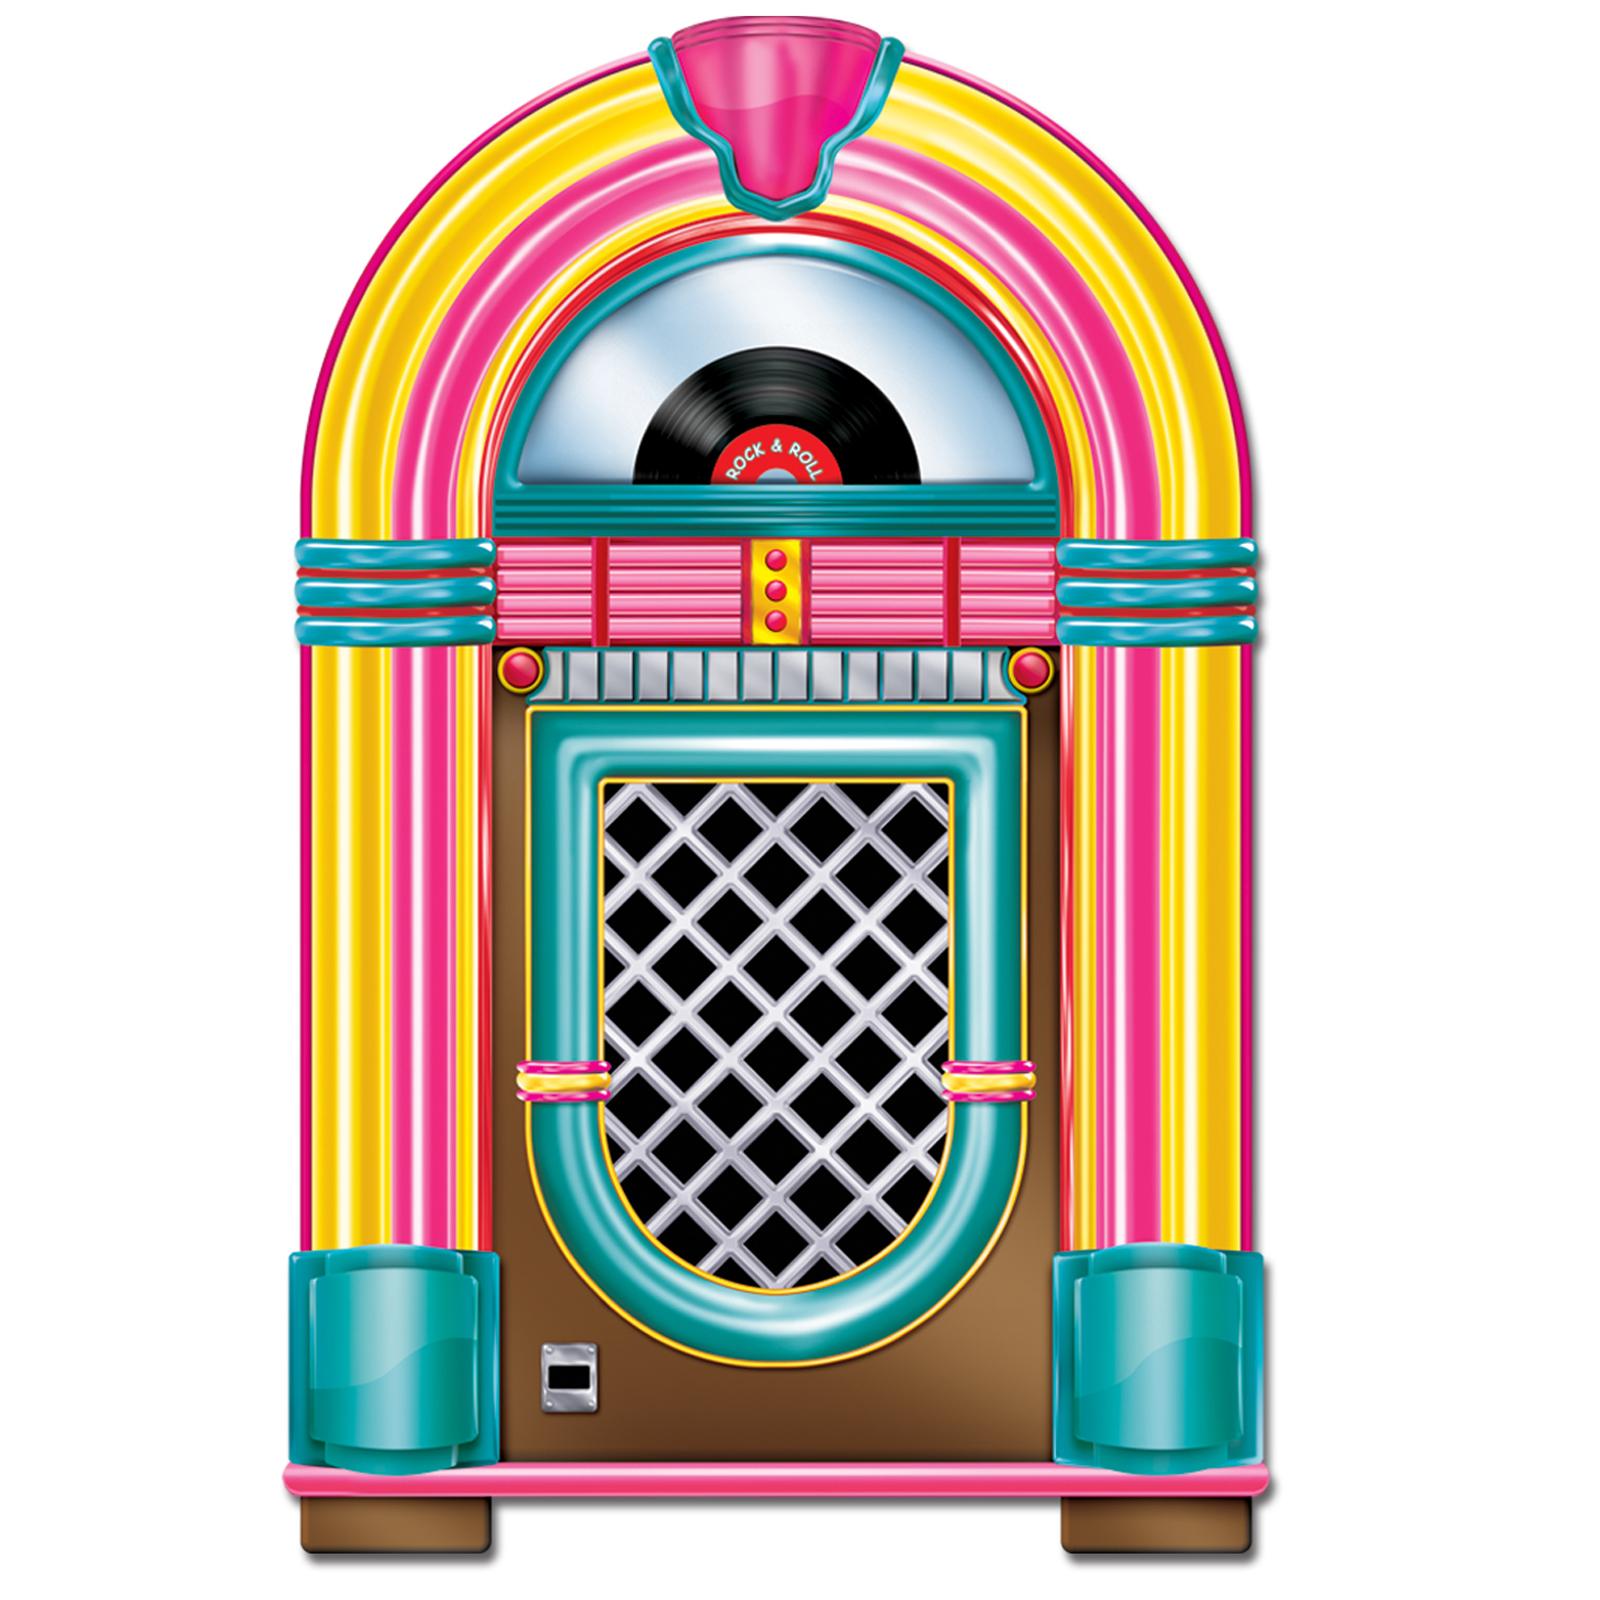 1950's Jukebox Centerpiece | | Clipart Panda - Free Clipart Images